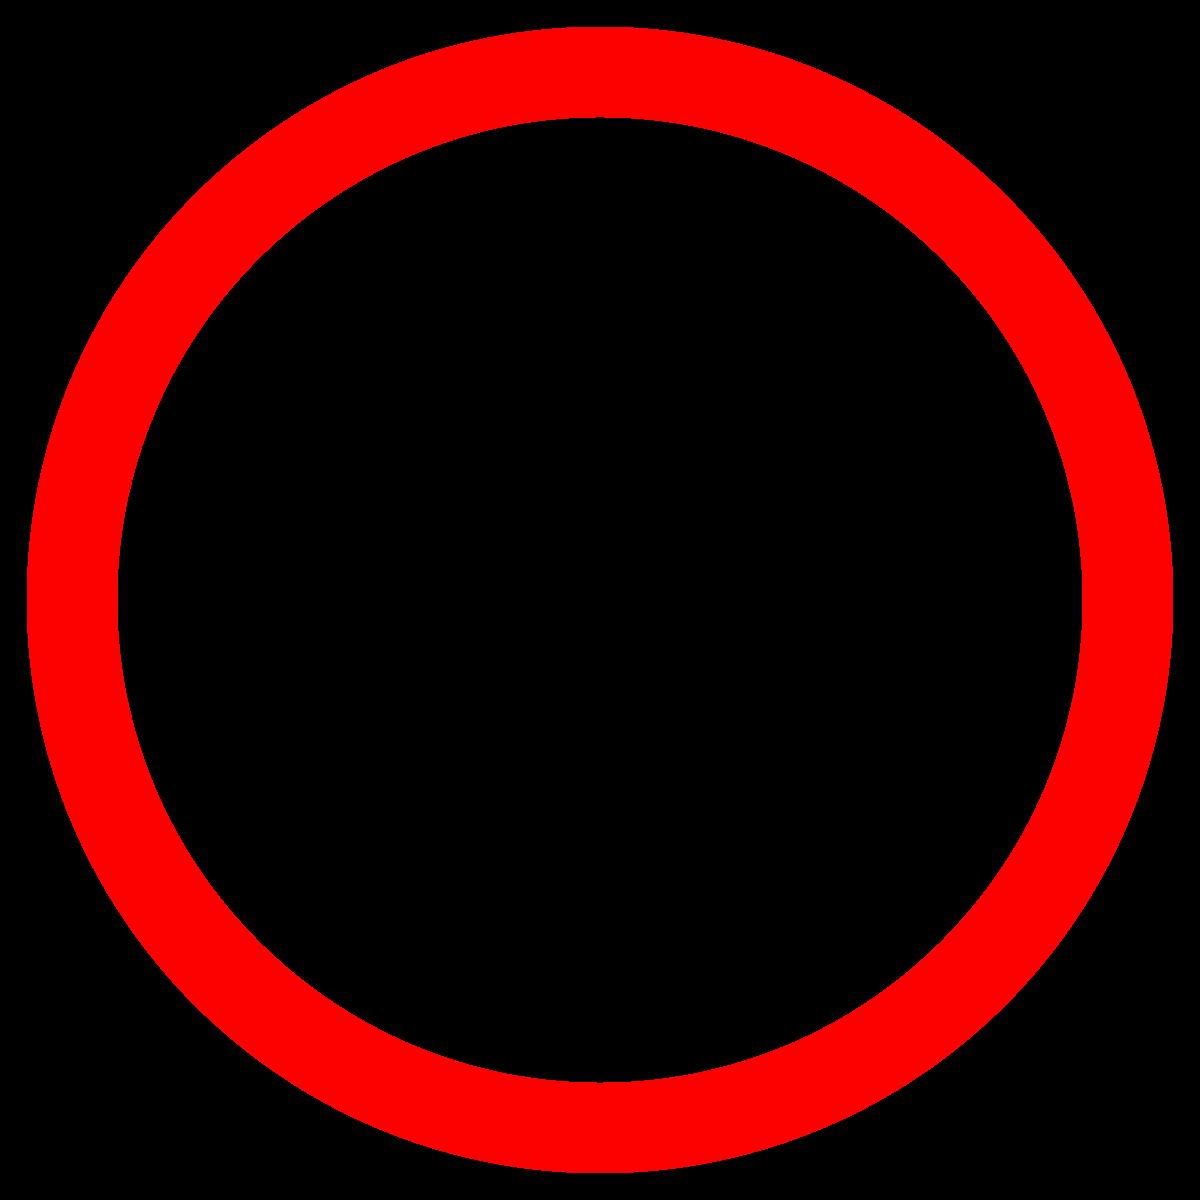 Png Red Circle Circle Clipart Circle Circle Outline